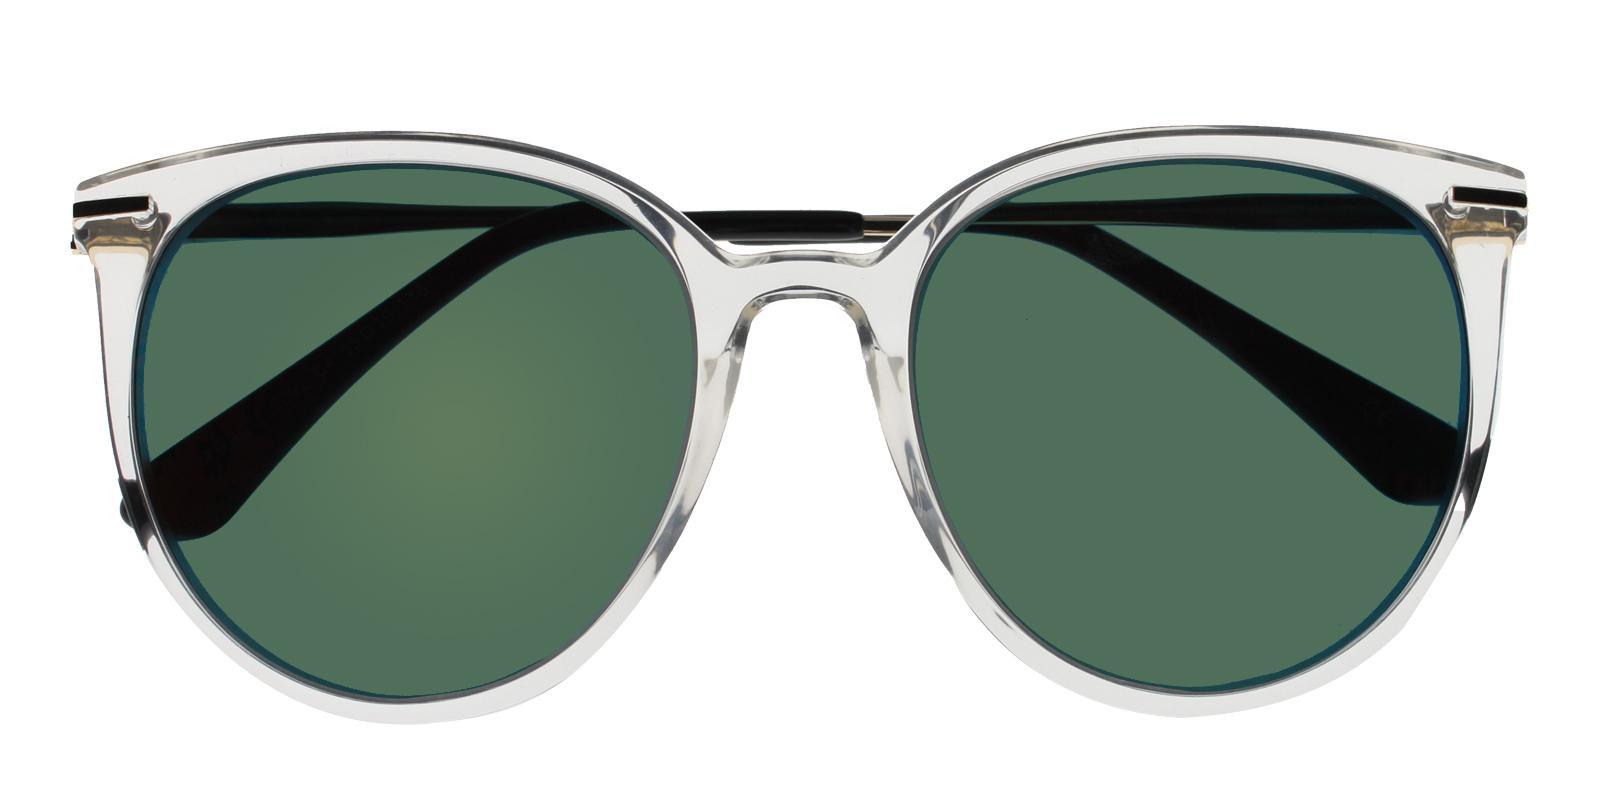 Isabella Translucent Metal , Combination , TR Sunglasses , UniversalBridgeFit Frames from ABBE Glasses